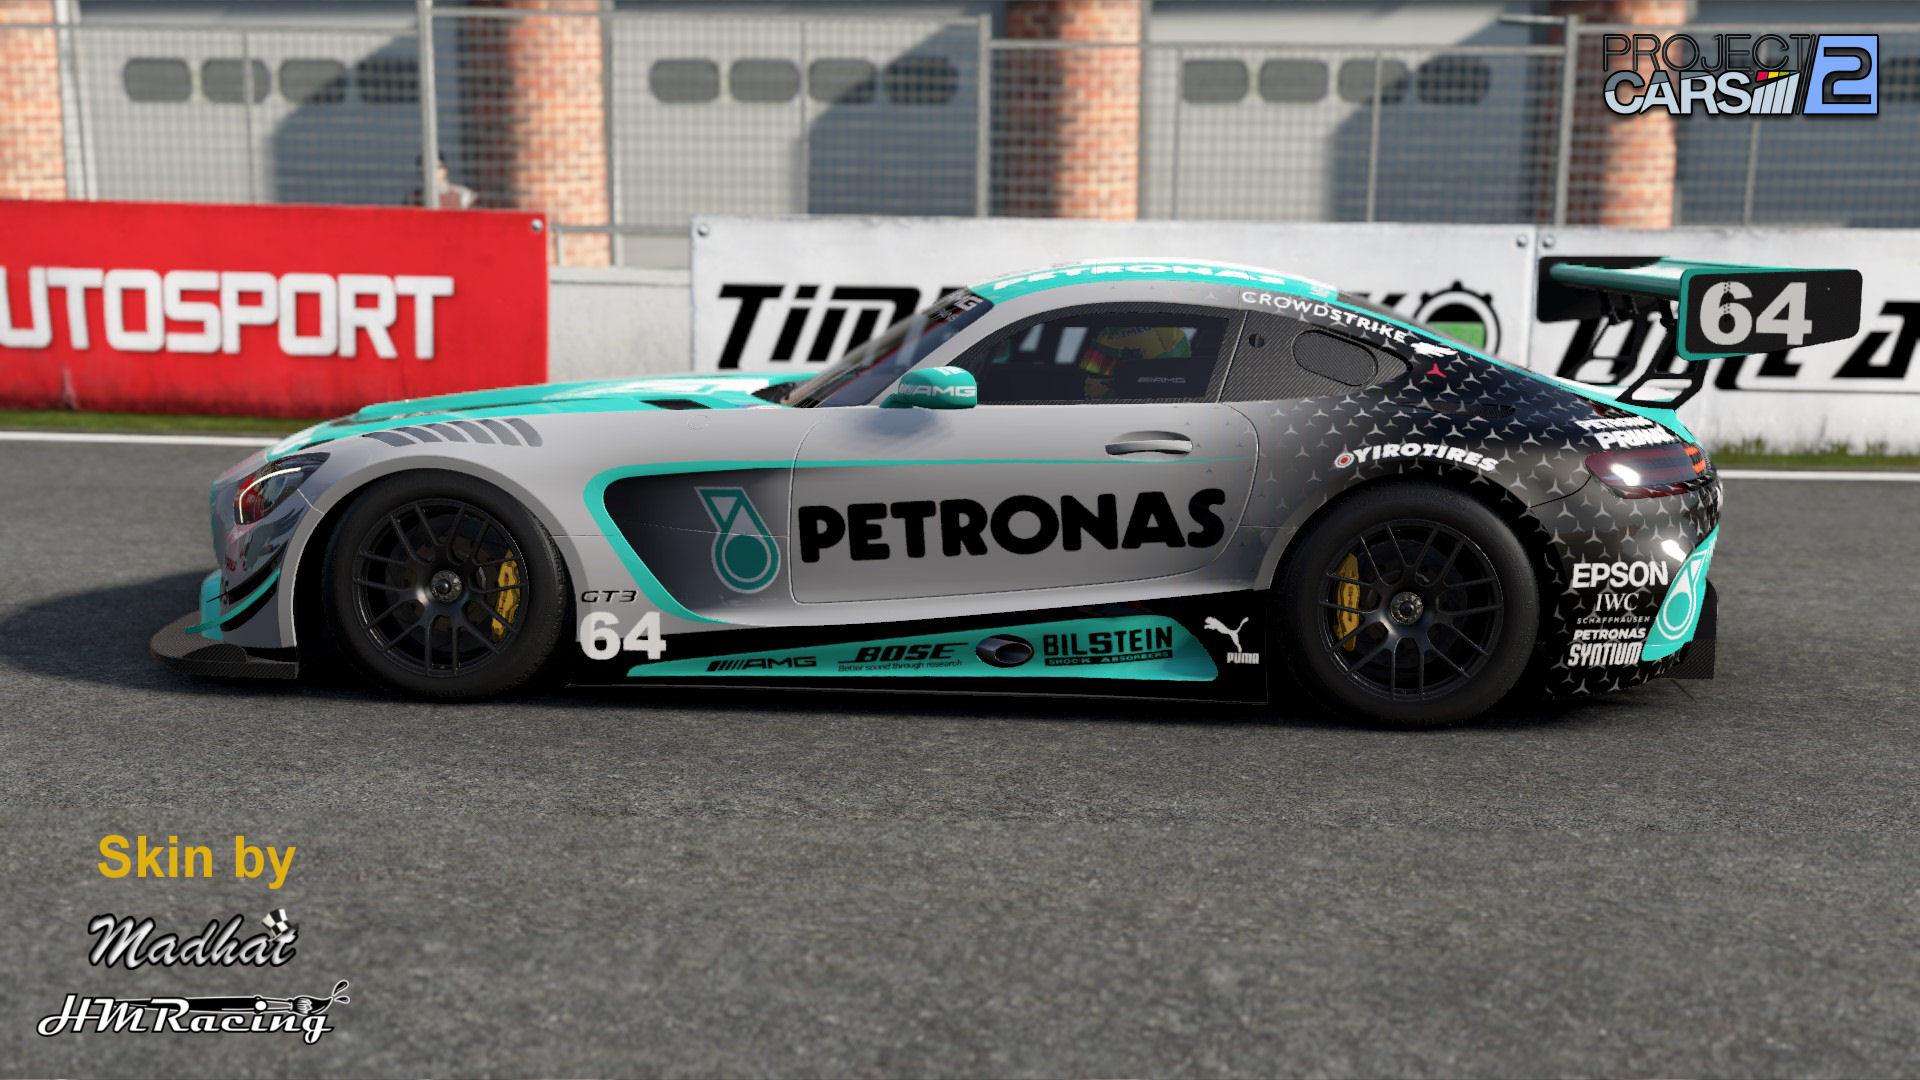 Mercedes AMG GT3 Petronas 02.jpg